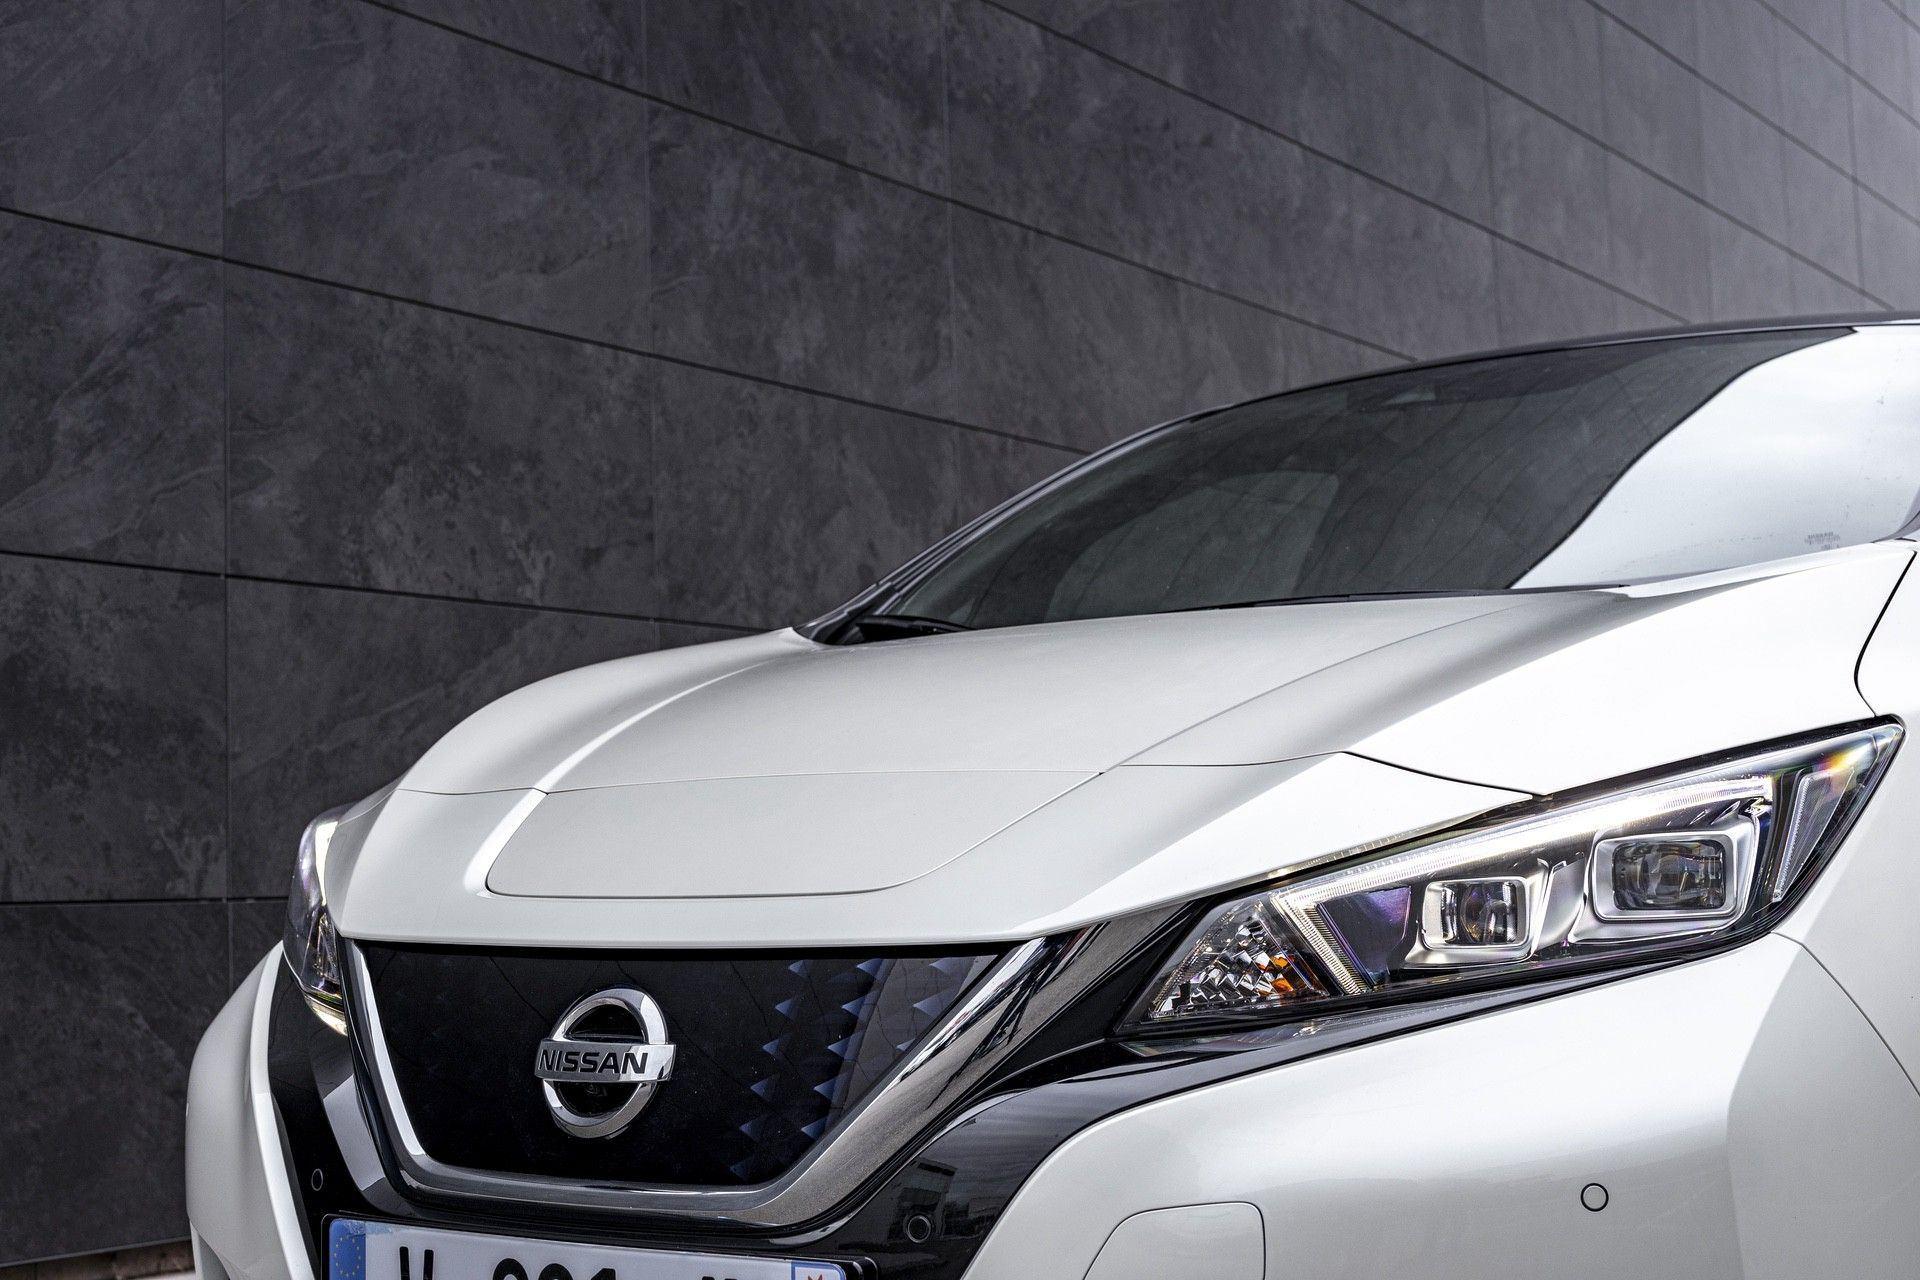 Nissan_Leaf10_special_edition-0003